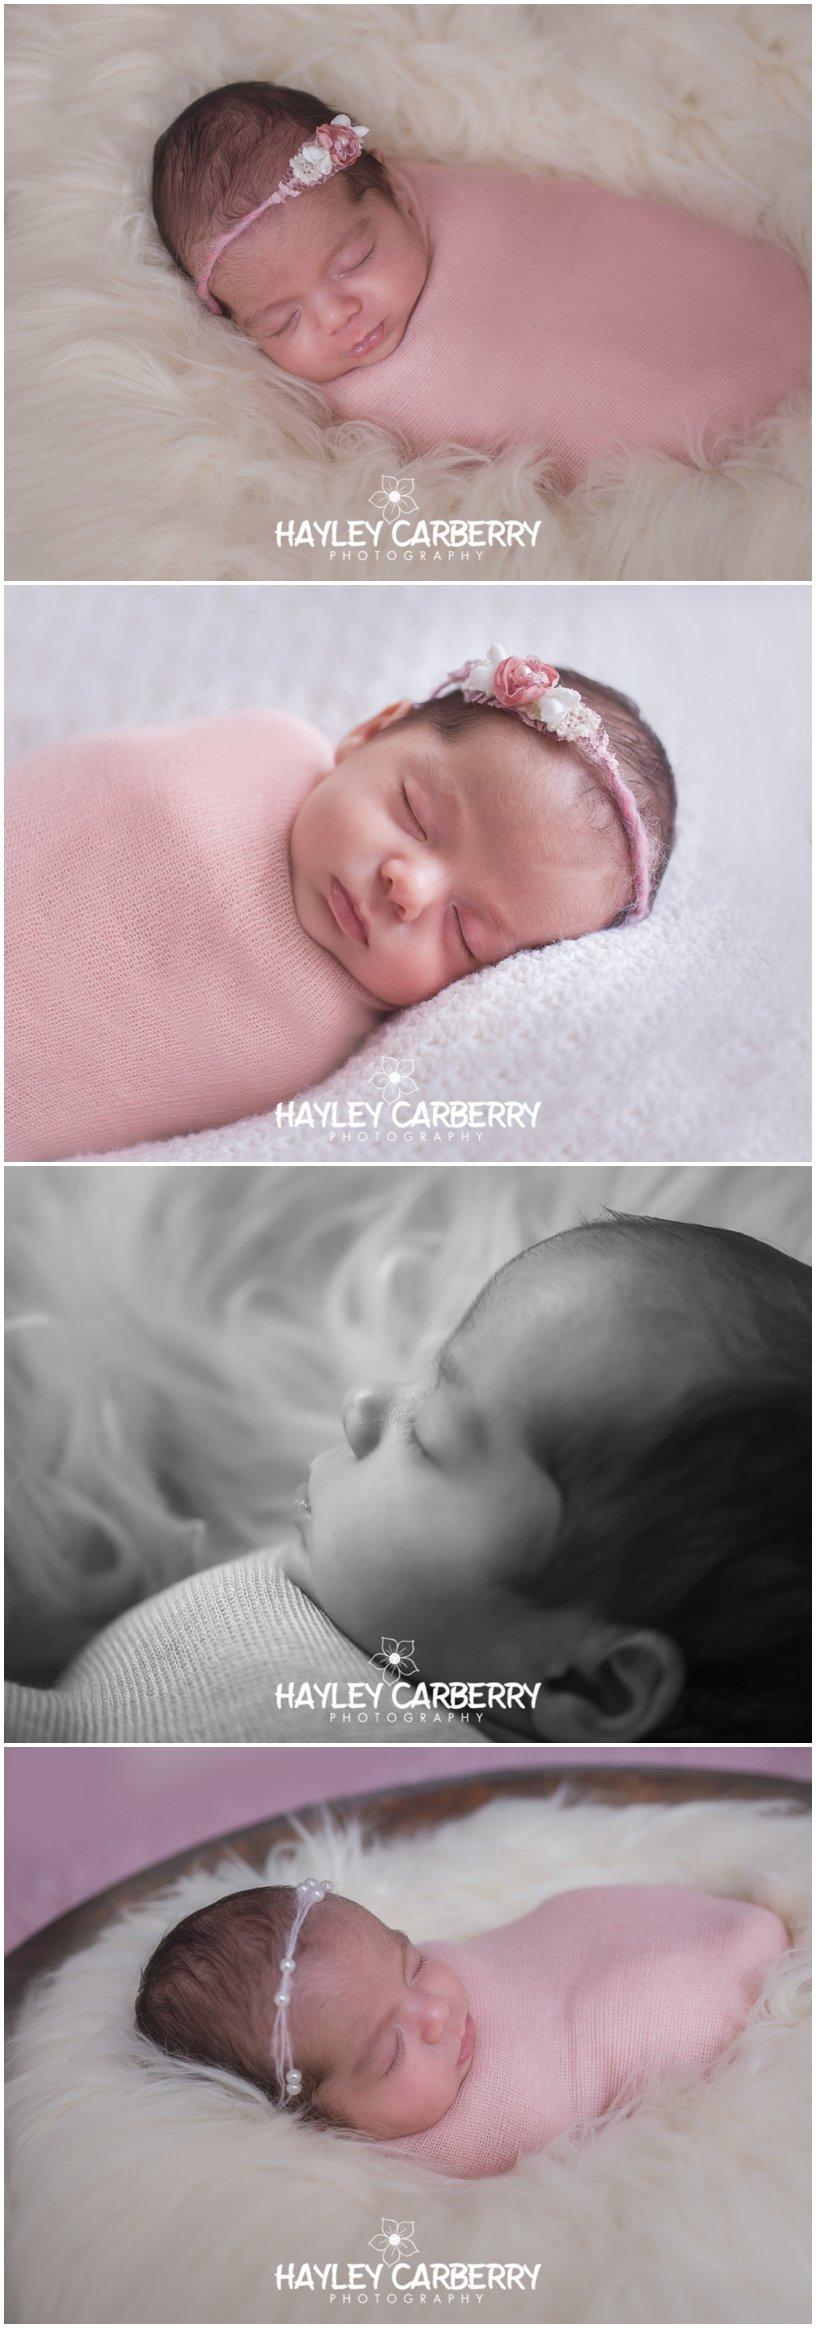 CanberraChildrenfamilyphotographer-14_WEB.jpg